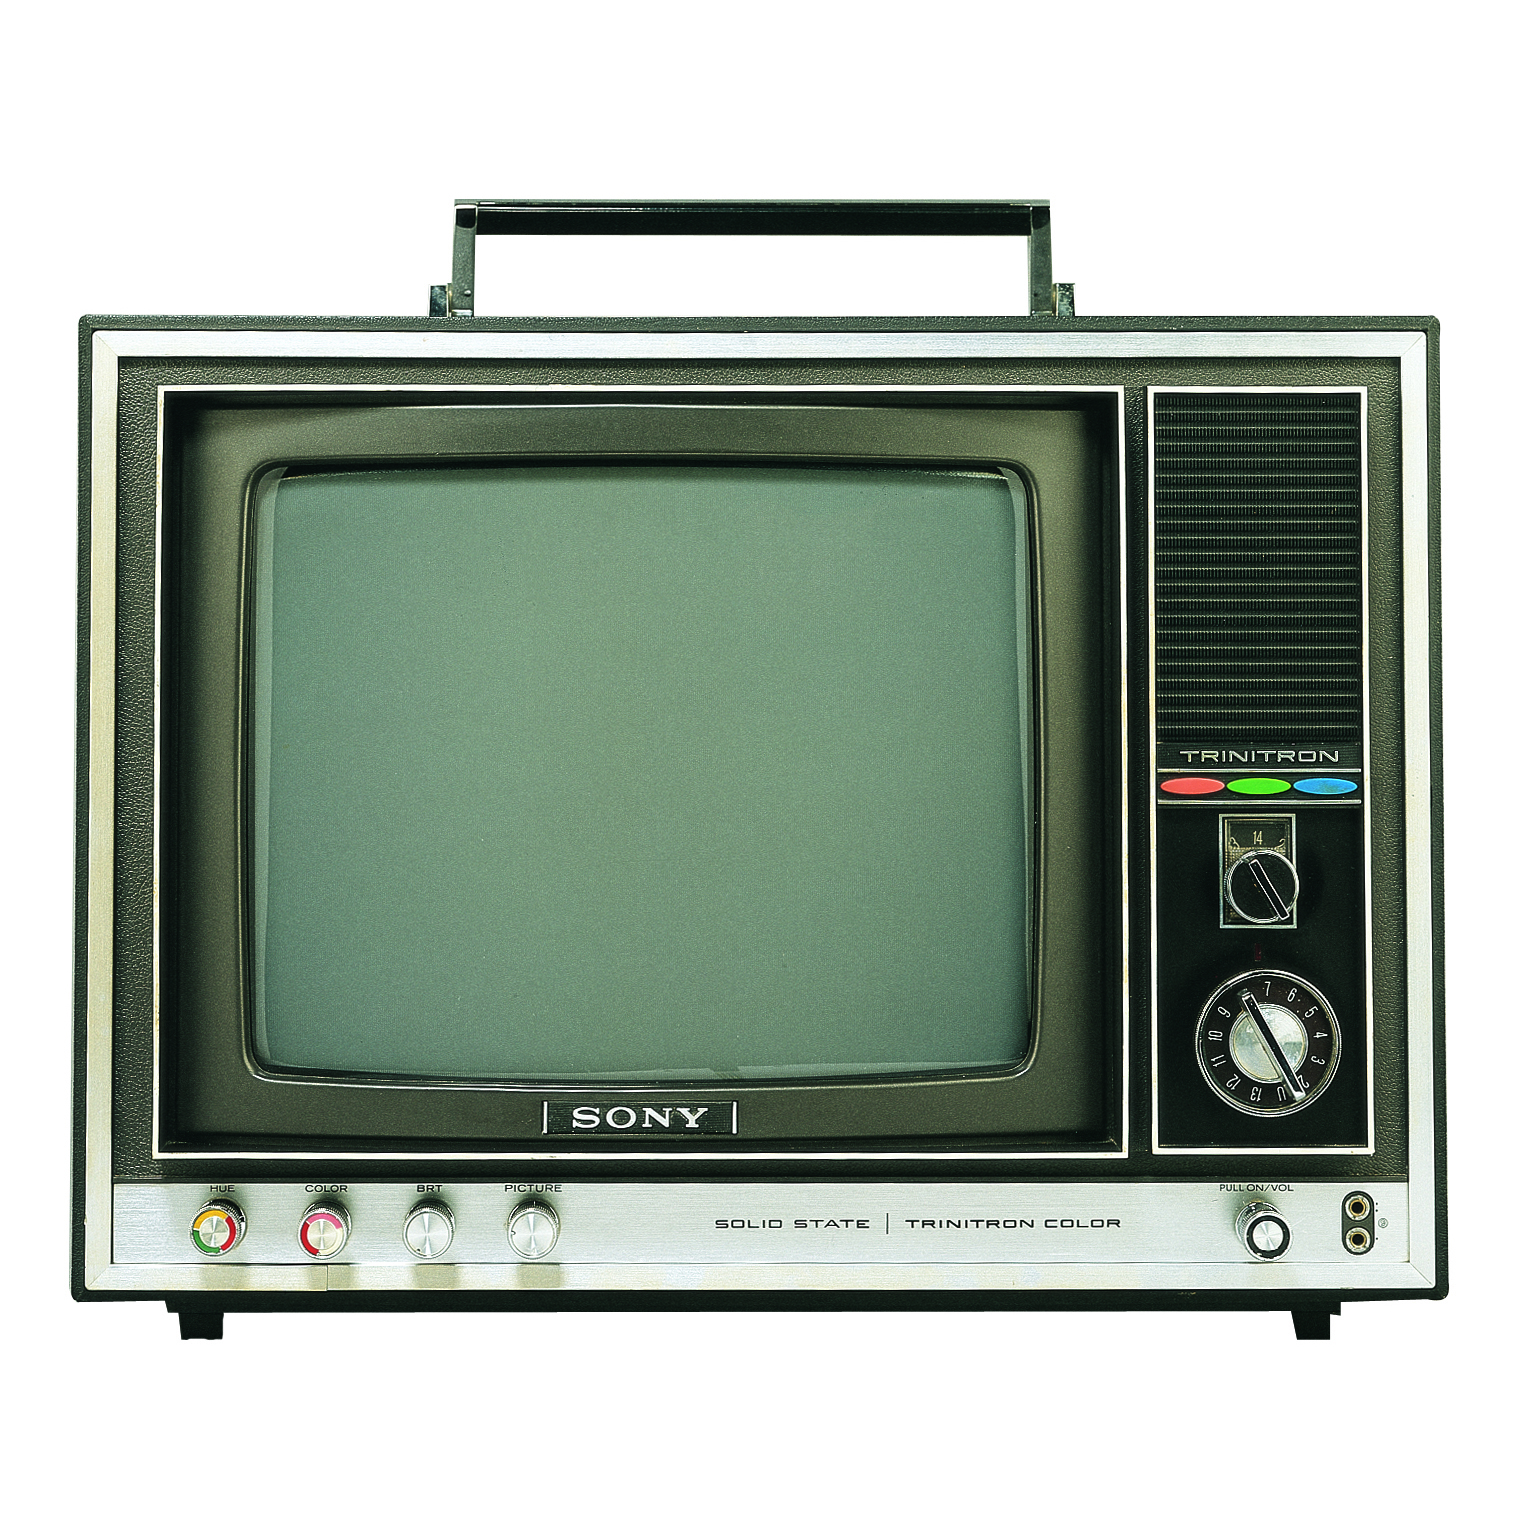 Sony, Trinitron Colour Television